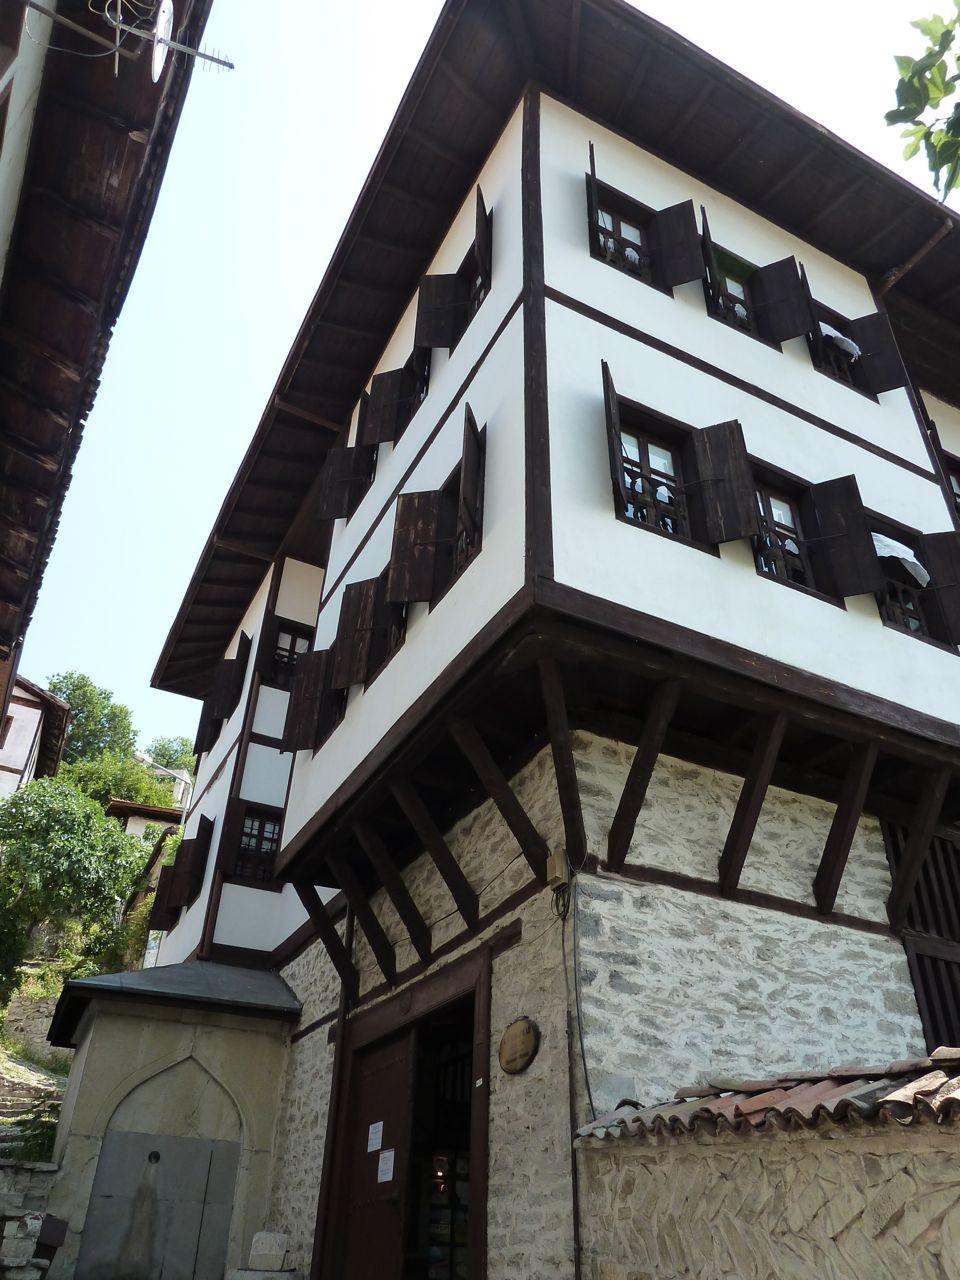 Ottoman House